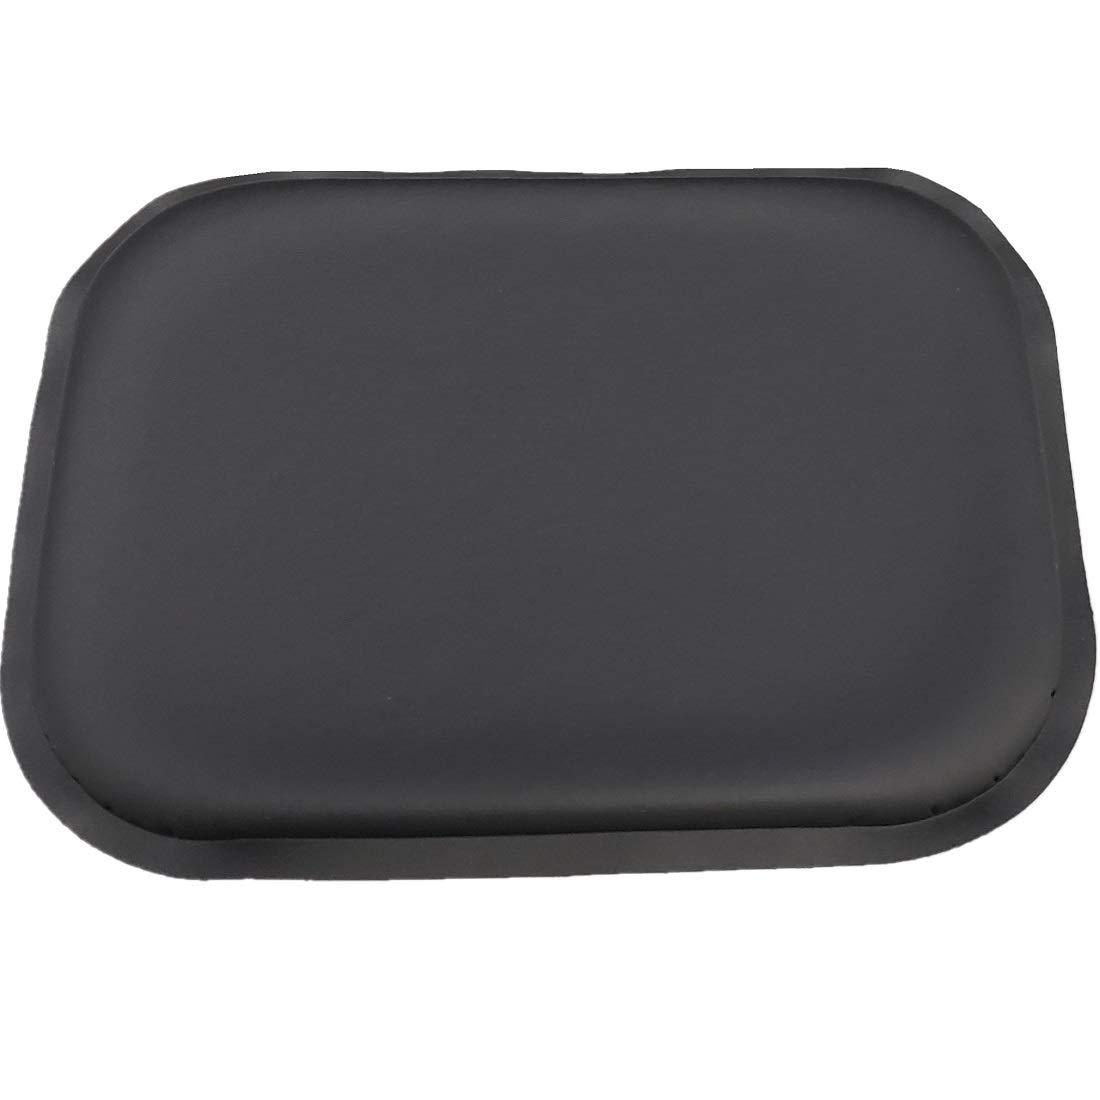 ULTRAGEL ''Gaming Super Comfy Arm/Elbow/Wrist Rest Gel Pad (Mouse Wrist Pad 5.5x7.5, Black)